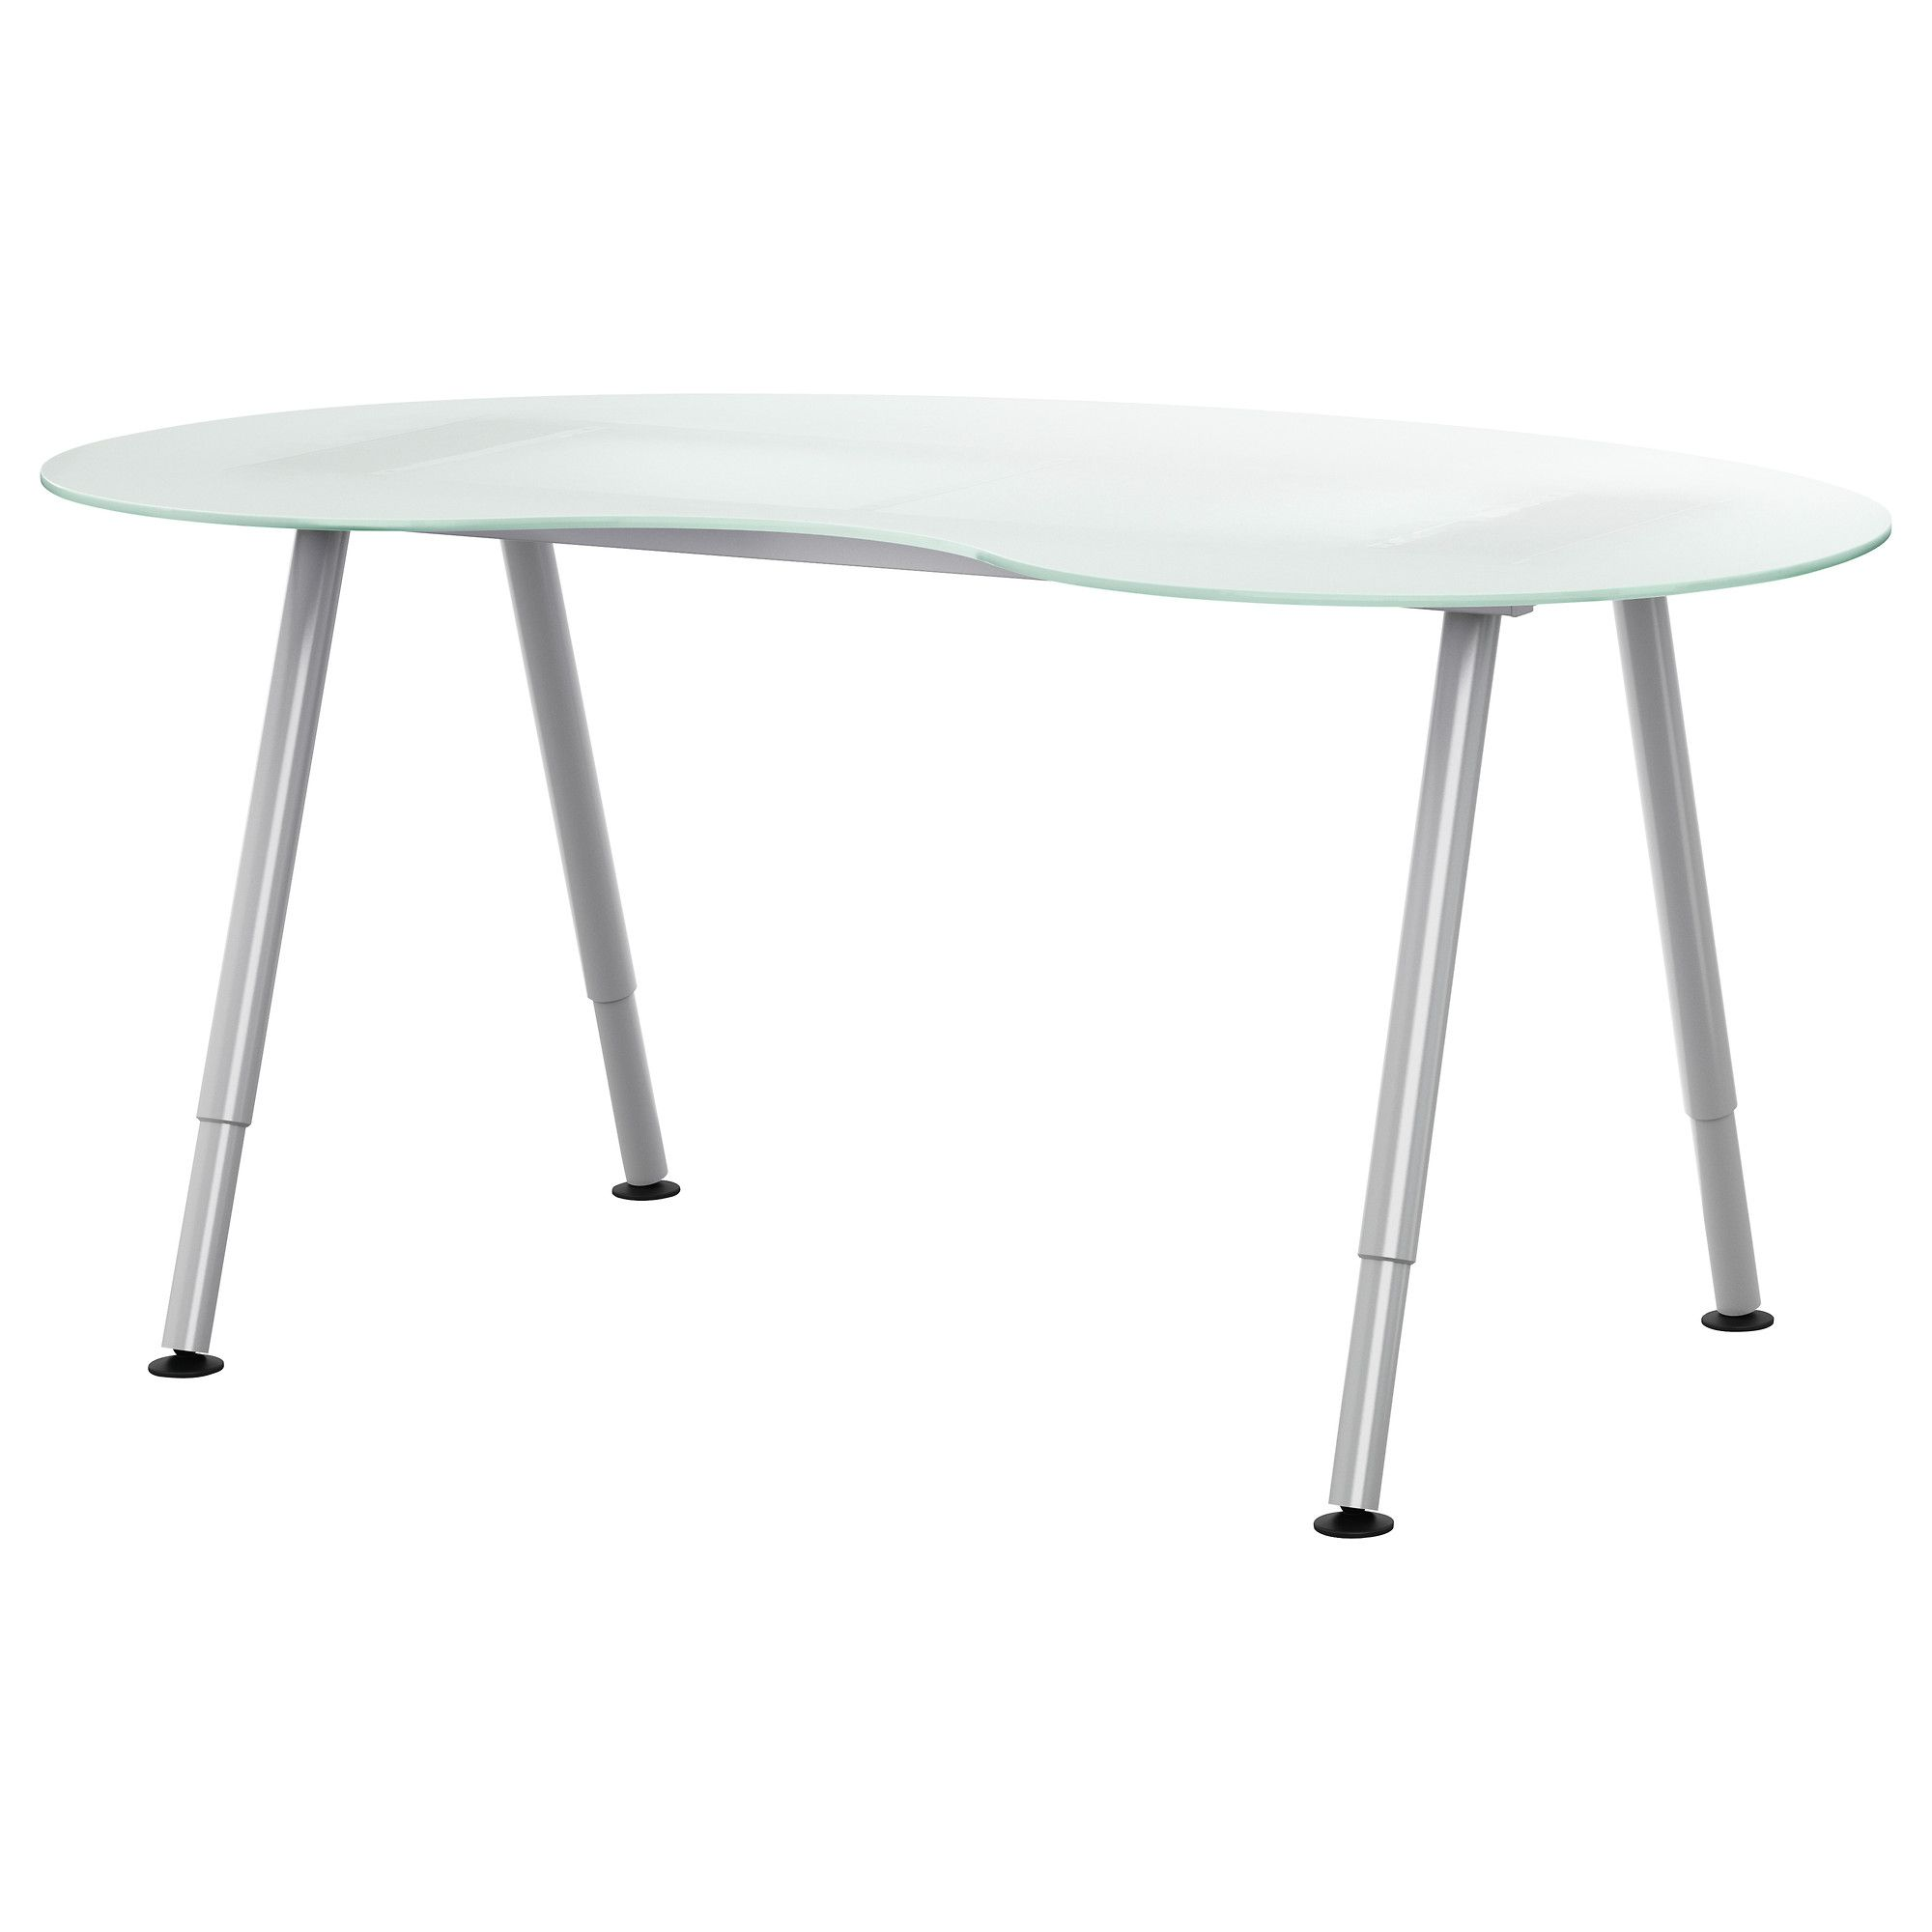 Us Furniture And Home Furnishings Ikea Glass Desk Ikea Glass Table Furniture